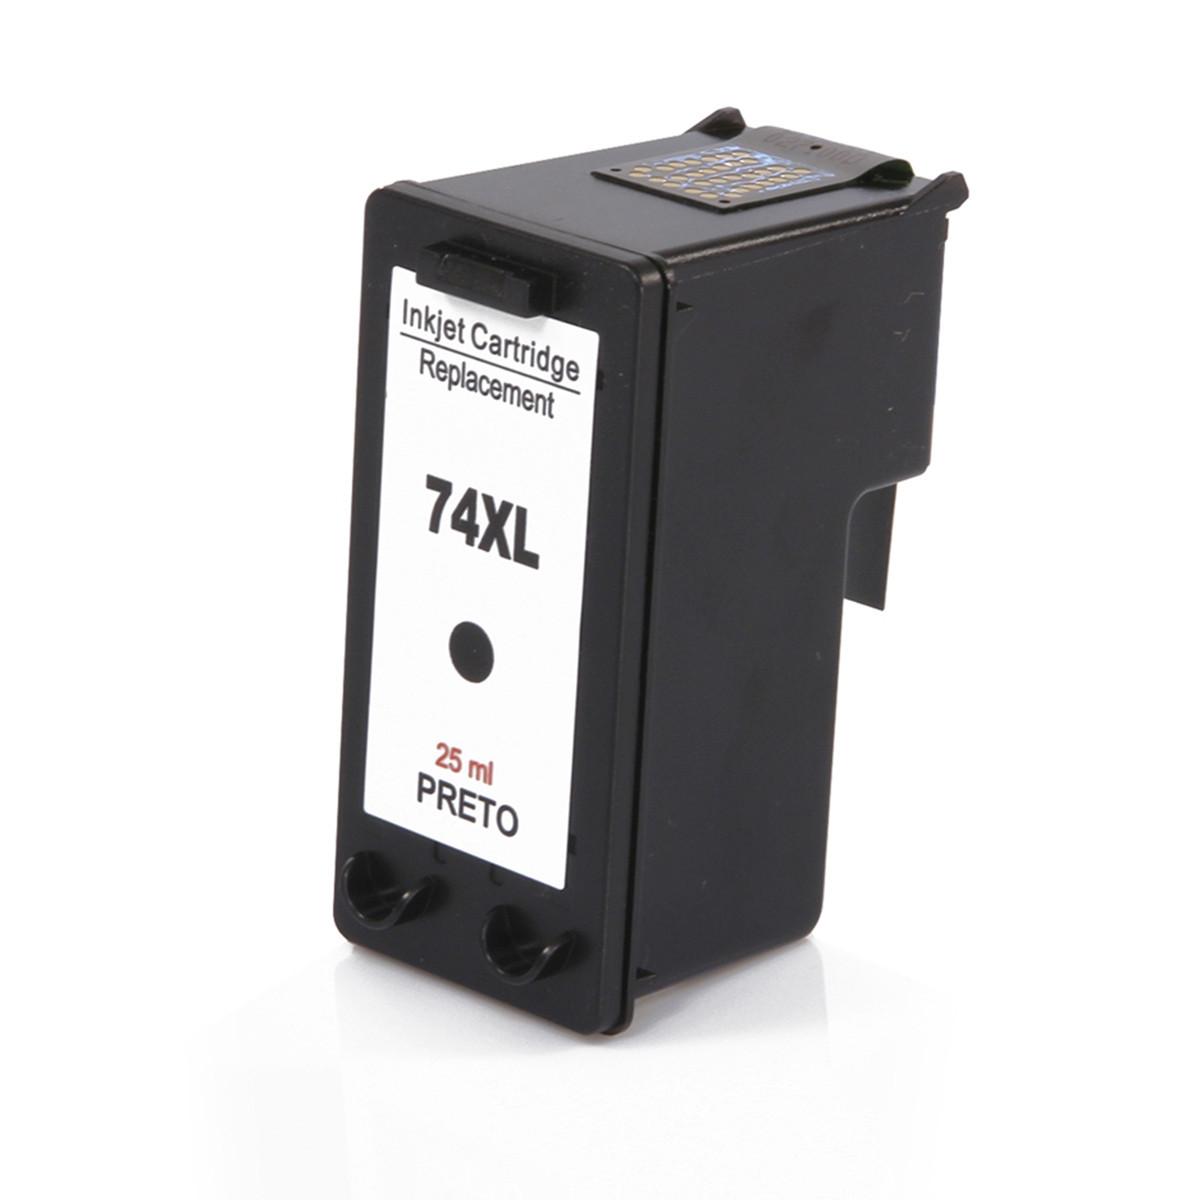 Cartucho de Tinta Compatível com HP 74XL CB336WB Preto   Photosmart C4480 C4280 C5280   25ml